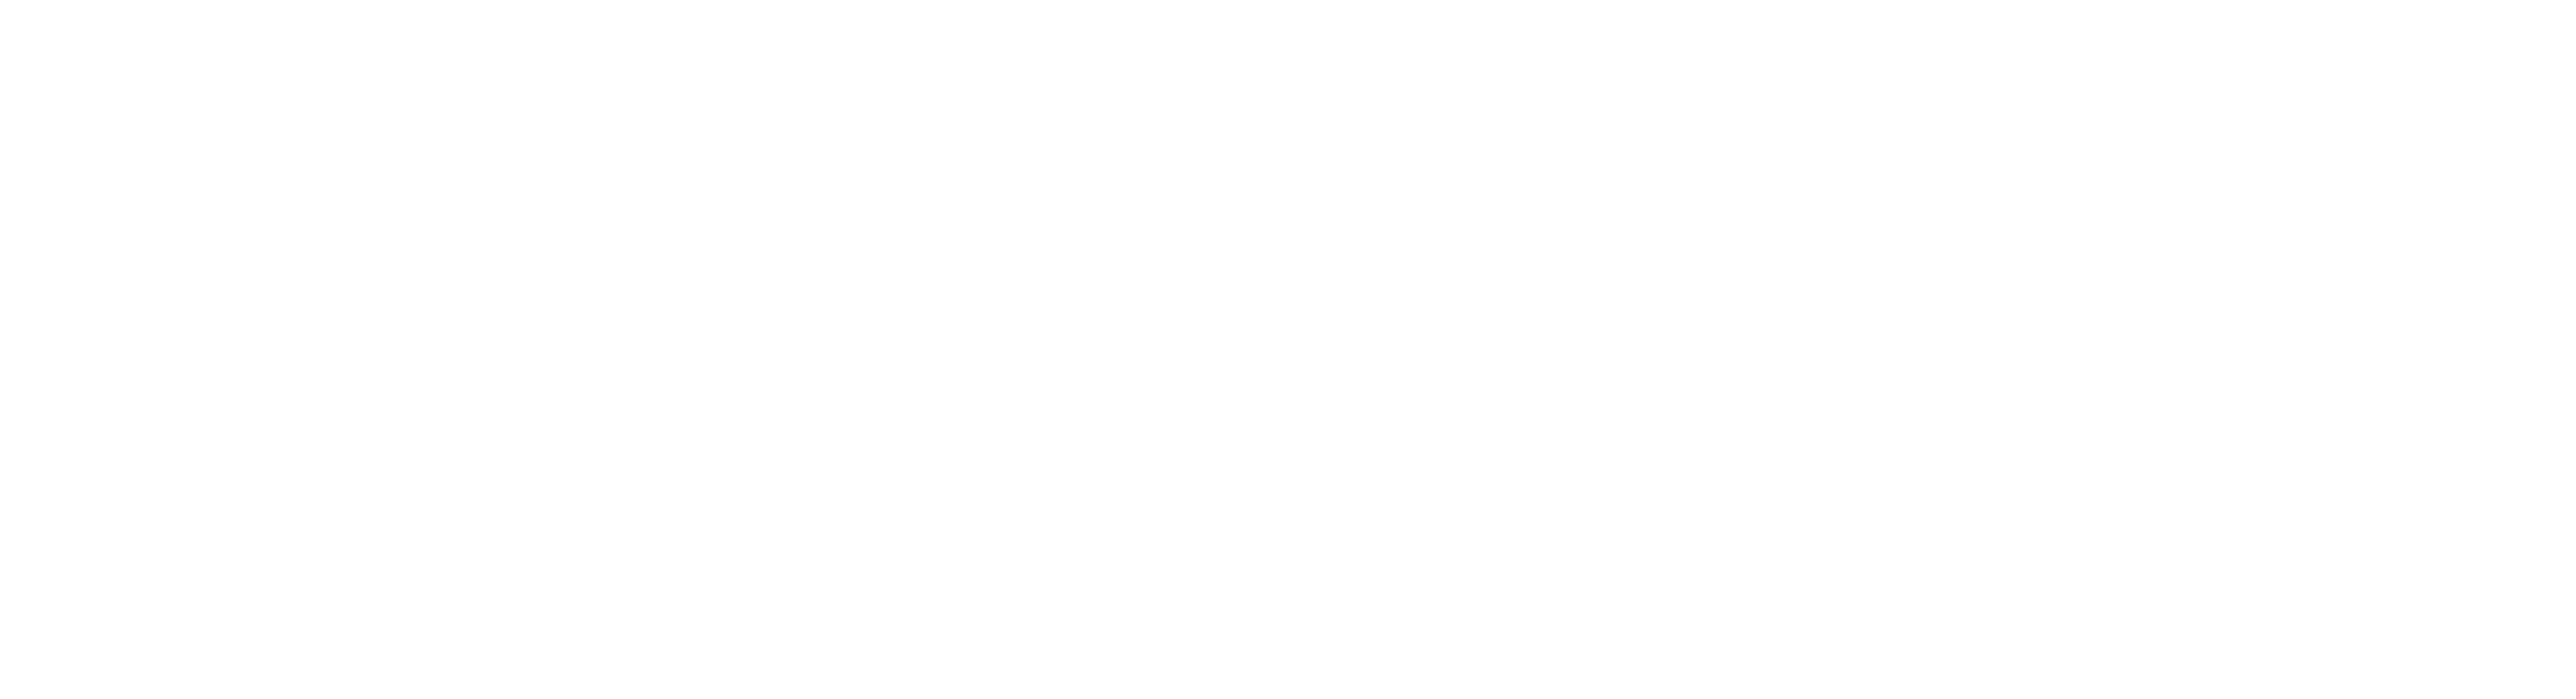 panache logo white